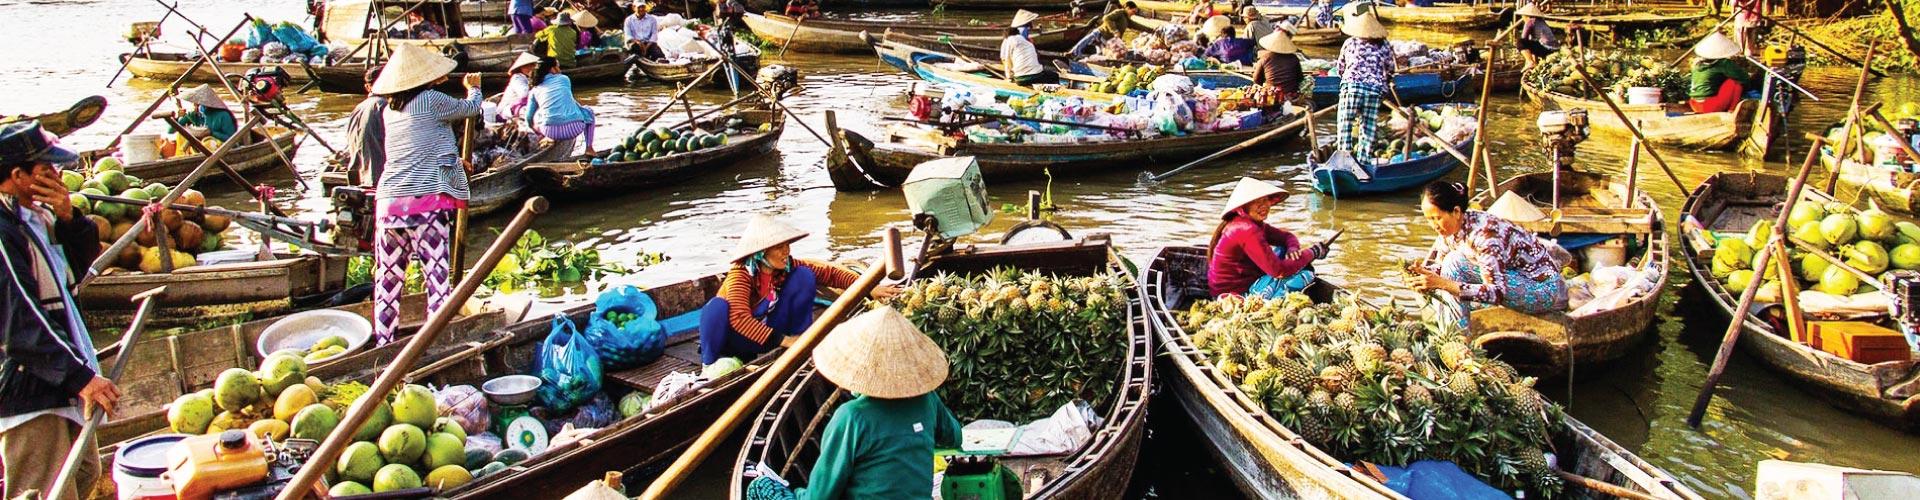 Can Tho & Chau Doc Discovery